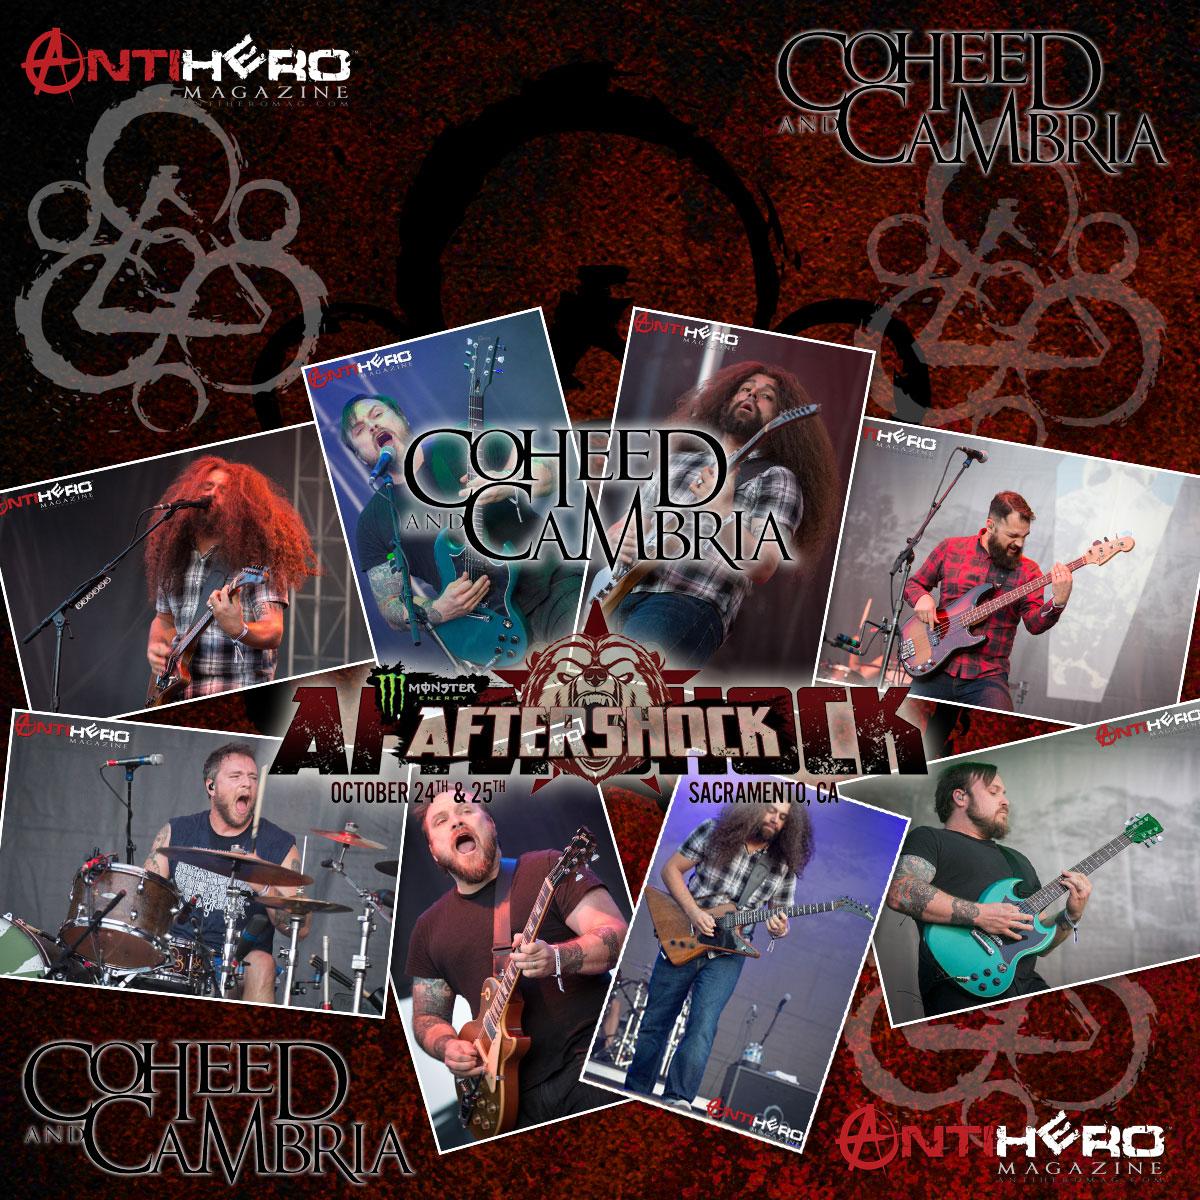 Aftershock 2015: COHEED AND CAMBRIA | Antihero Magazine